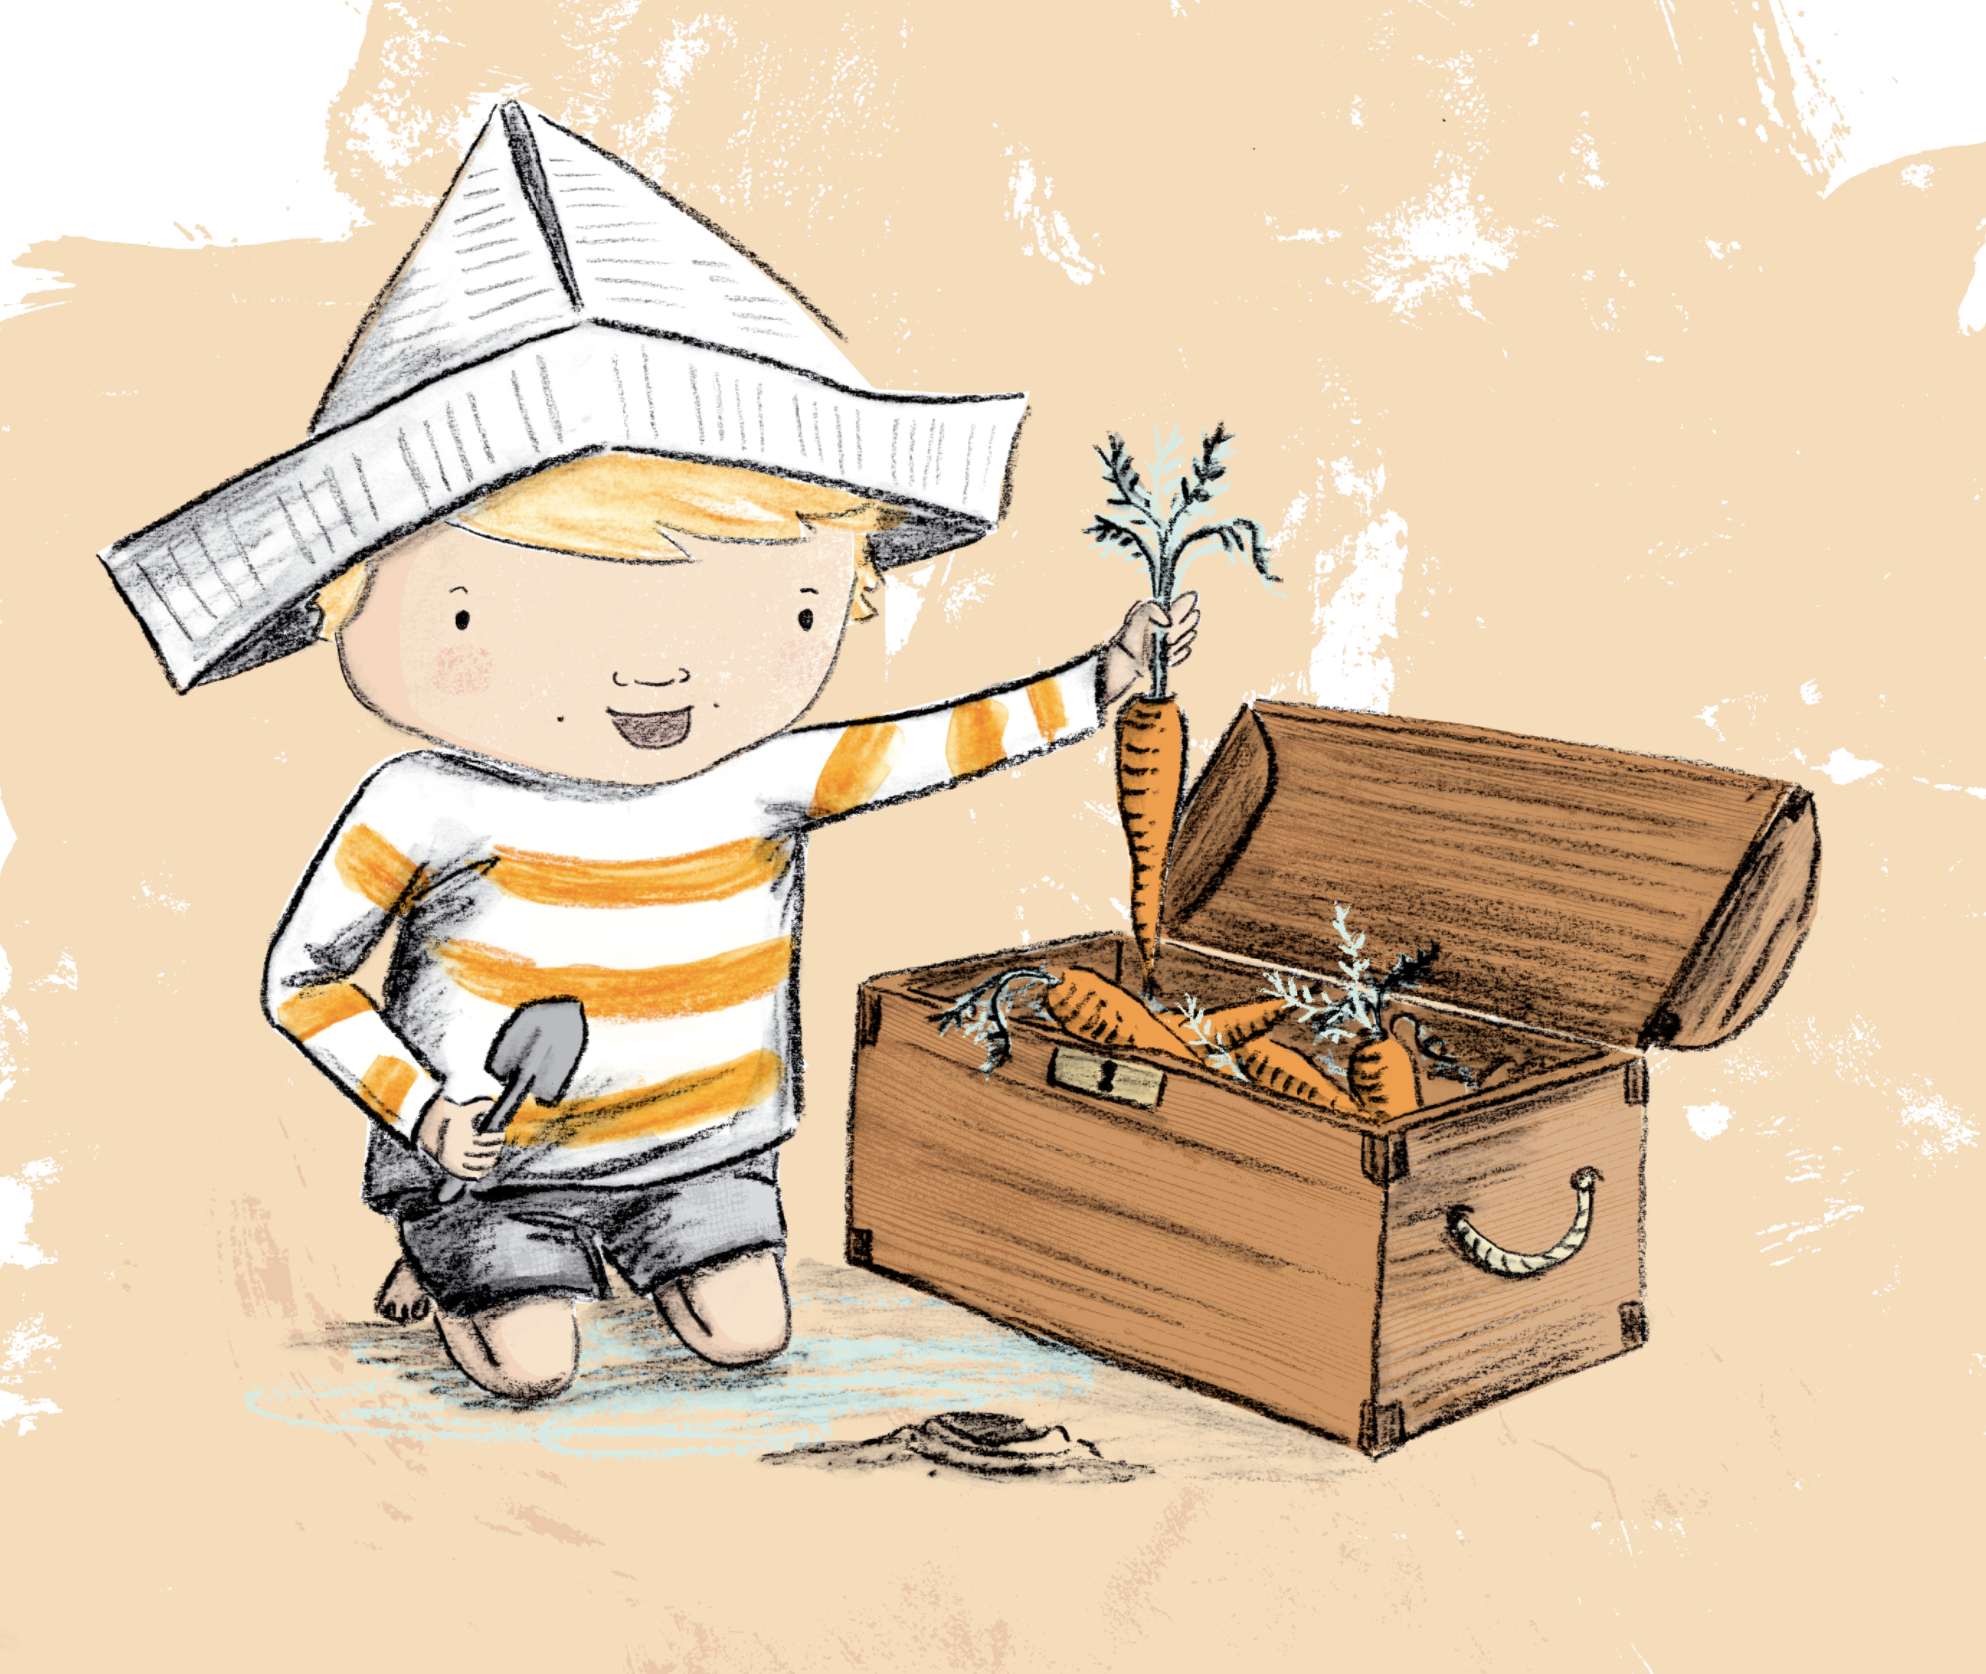 1, 2, Pirate Stew - Kylie Howarth